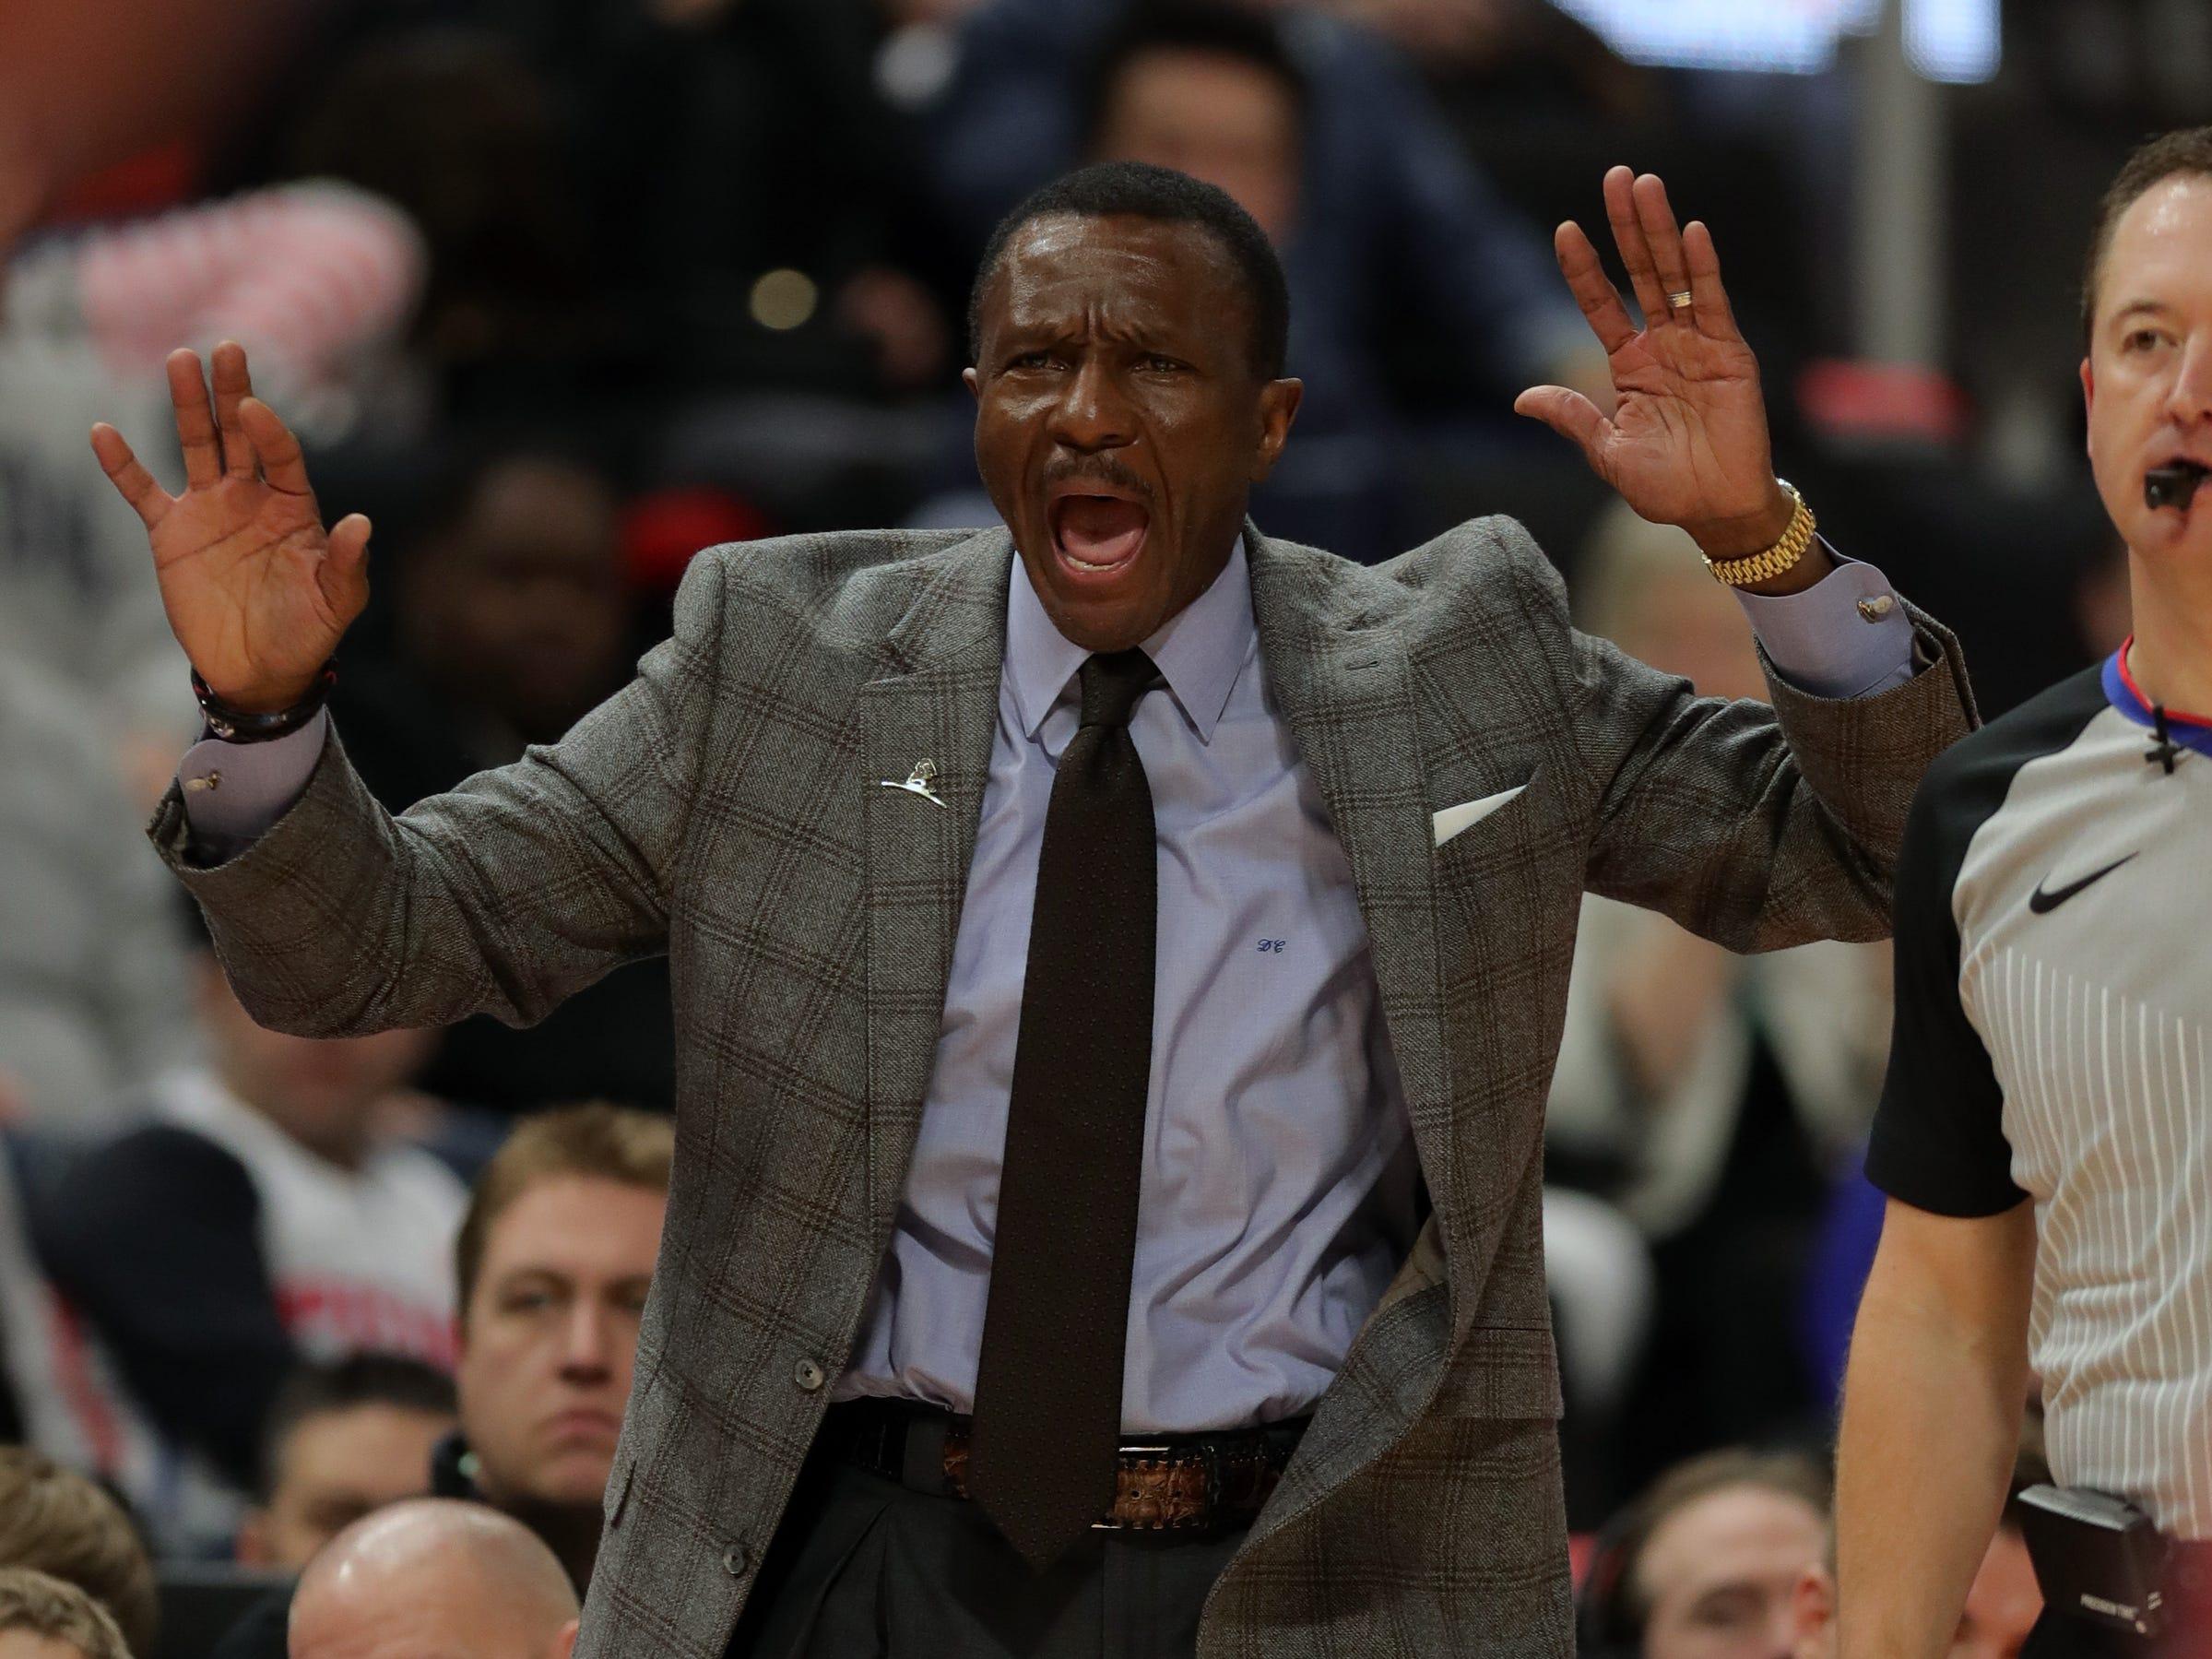 Game recap: Detroit Pistons defeat Minnesota Timberwolves, 131-114